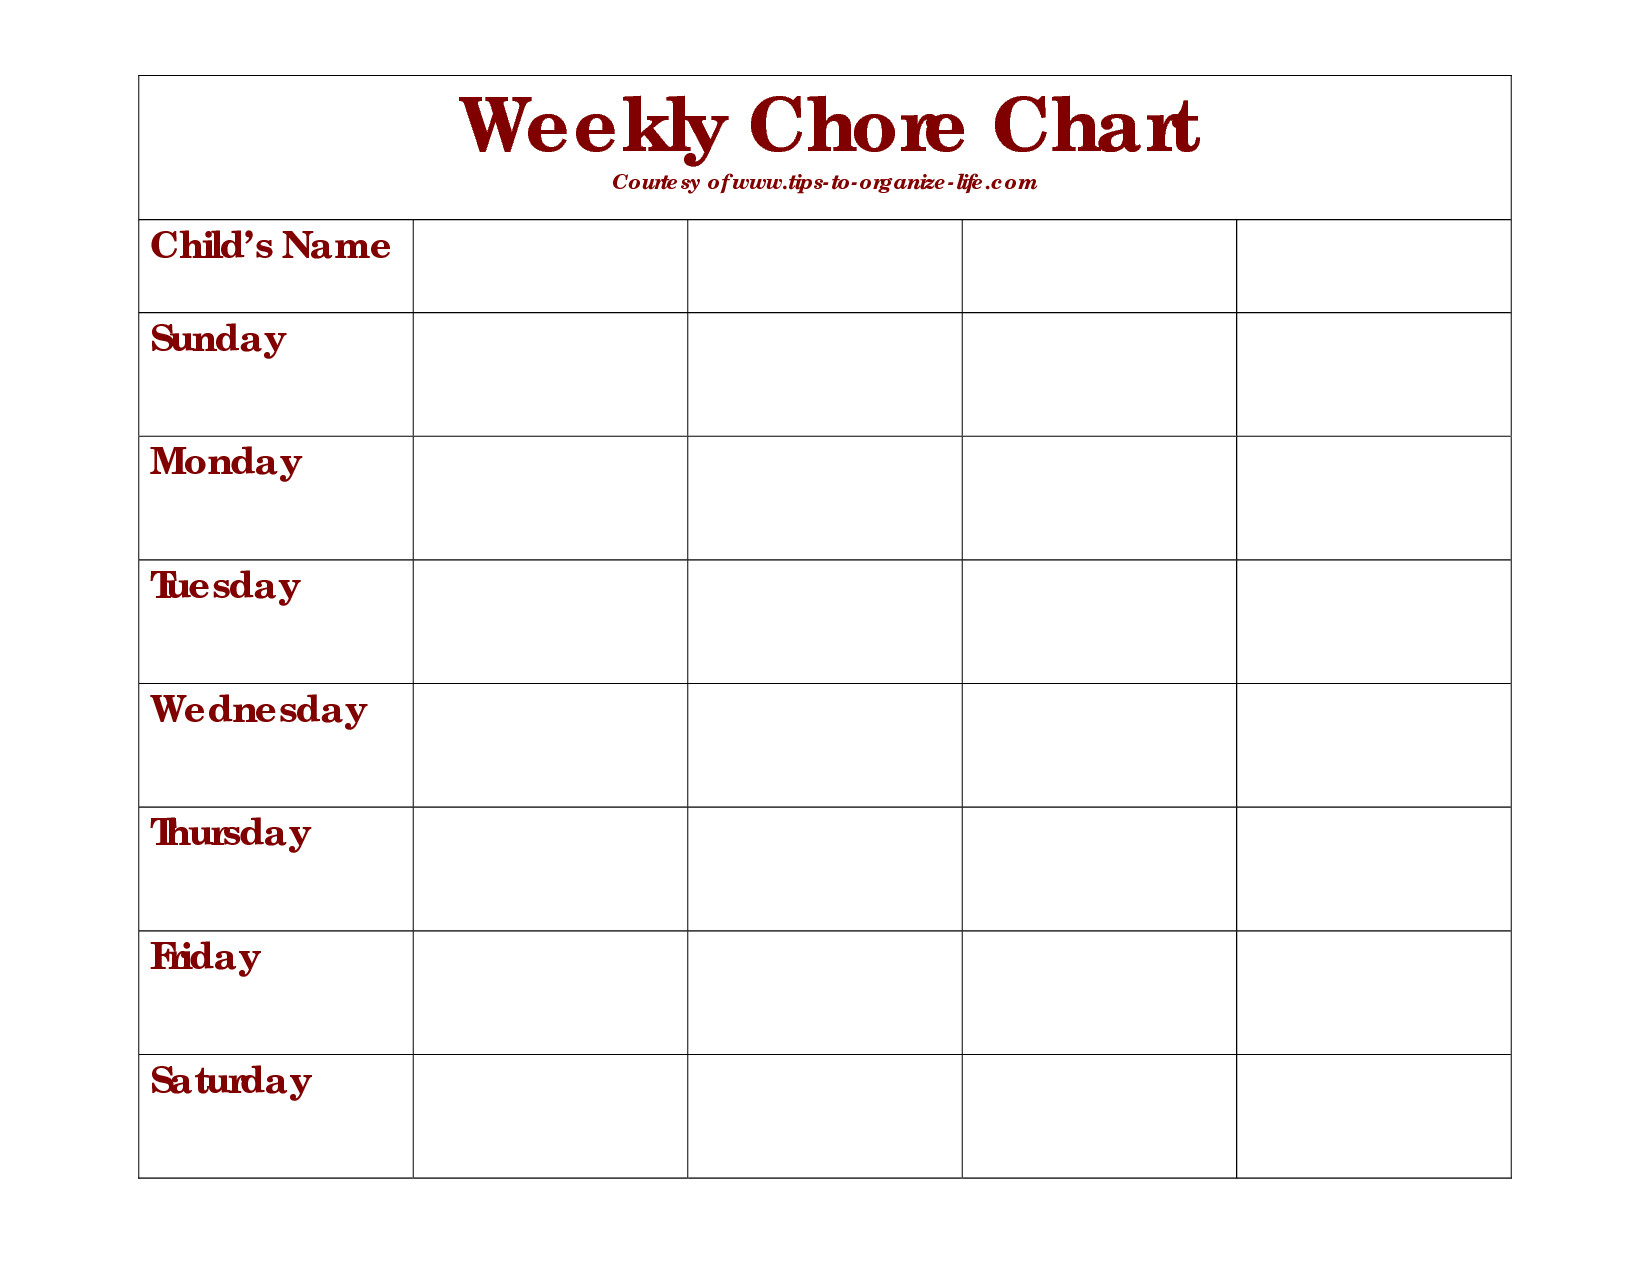 Daily Chore Chart Template Weekly Chore Chart